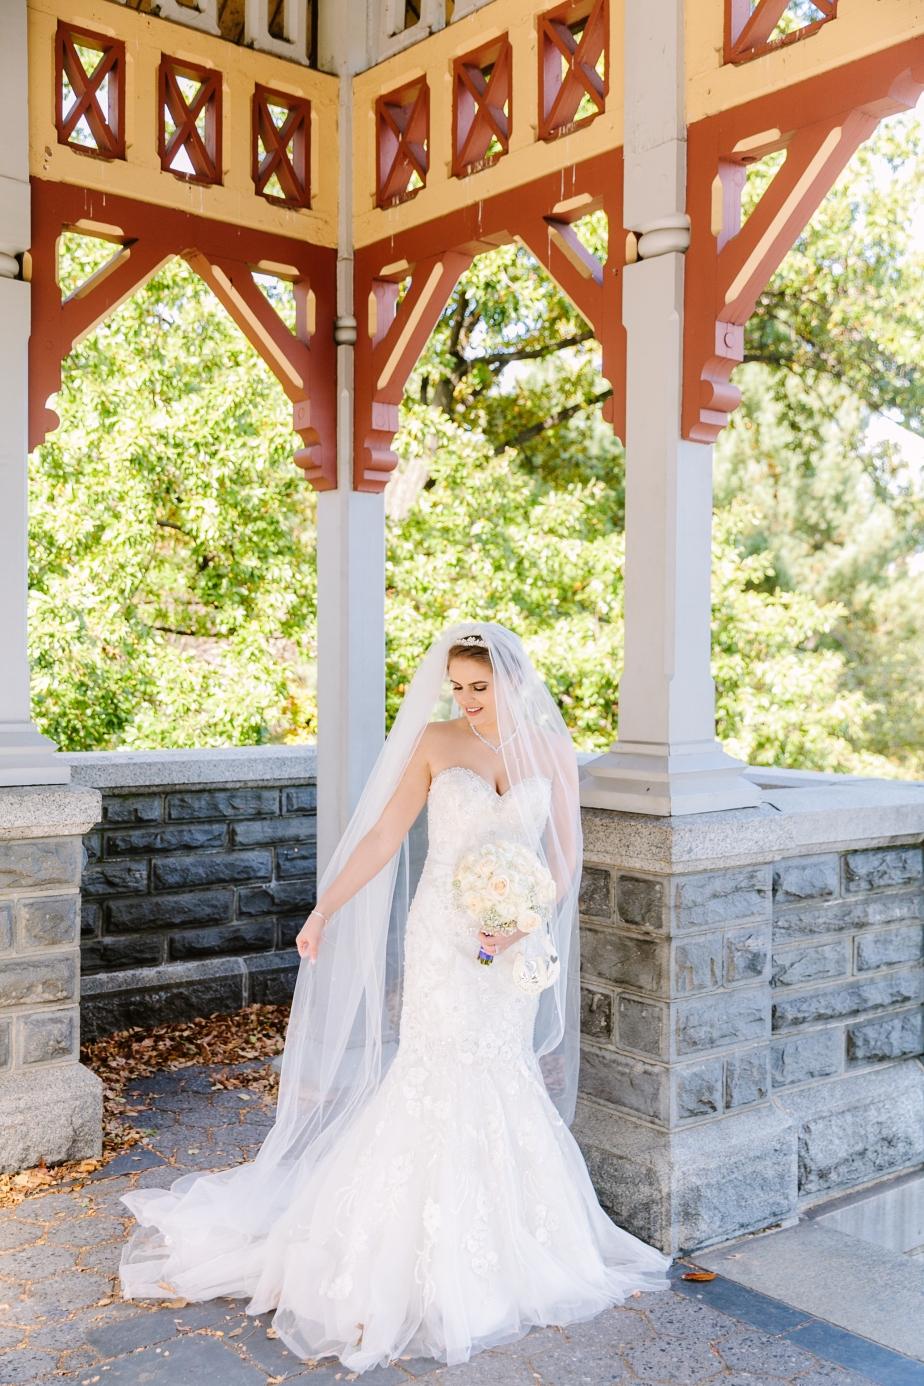 central-park_wedding-mj-48